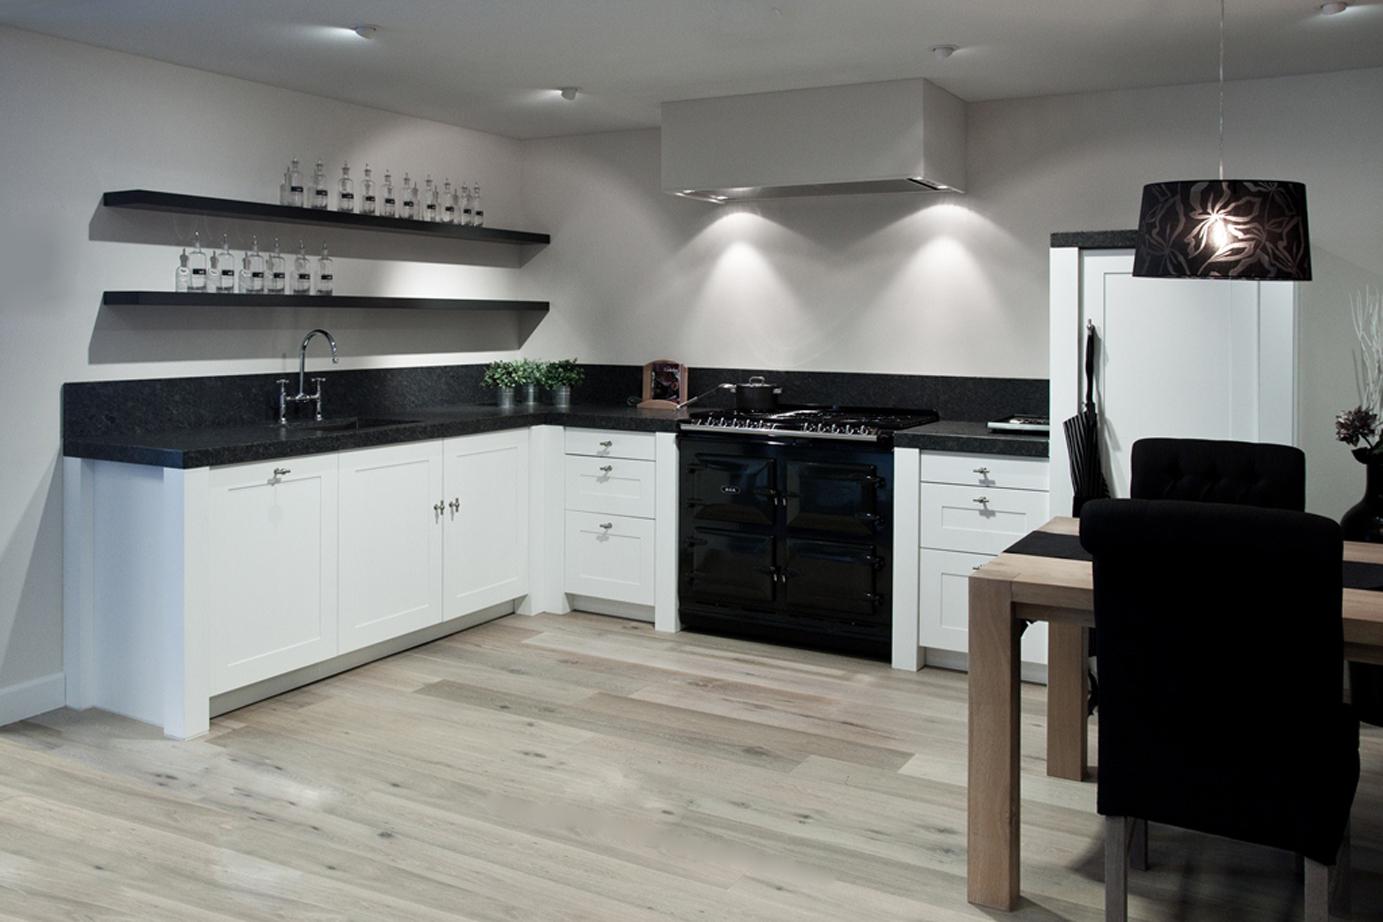 Kastenwand Keuken Te Koop : Witte keuken. Met prachtig aanrechtblad. – DB Keukens